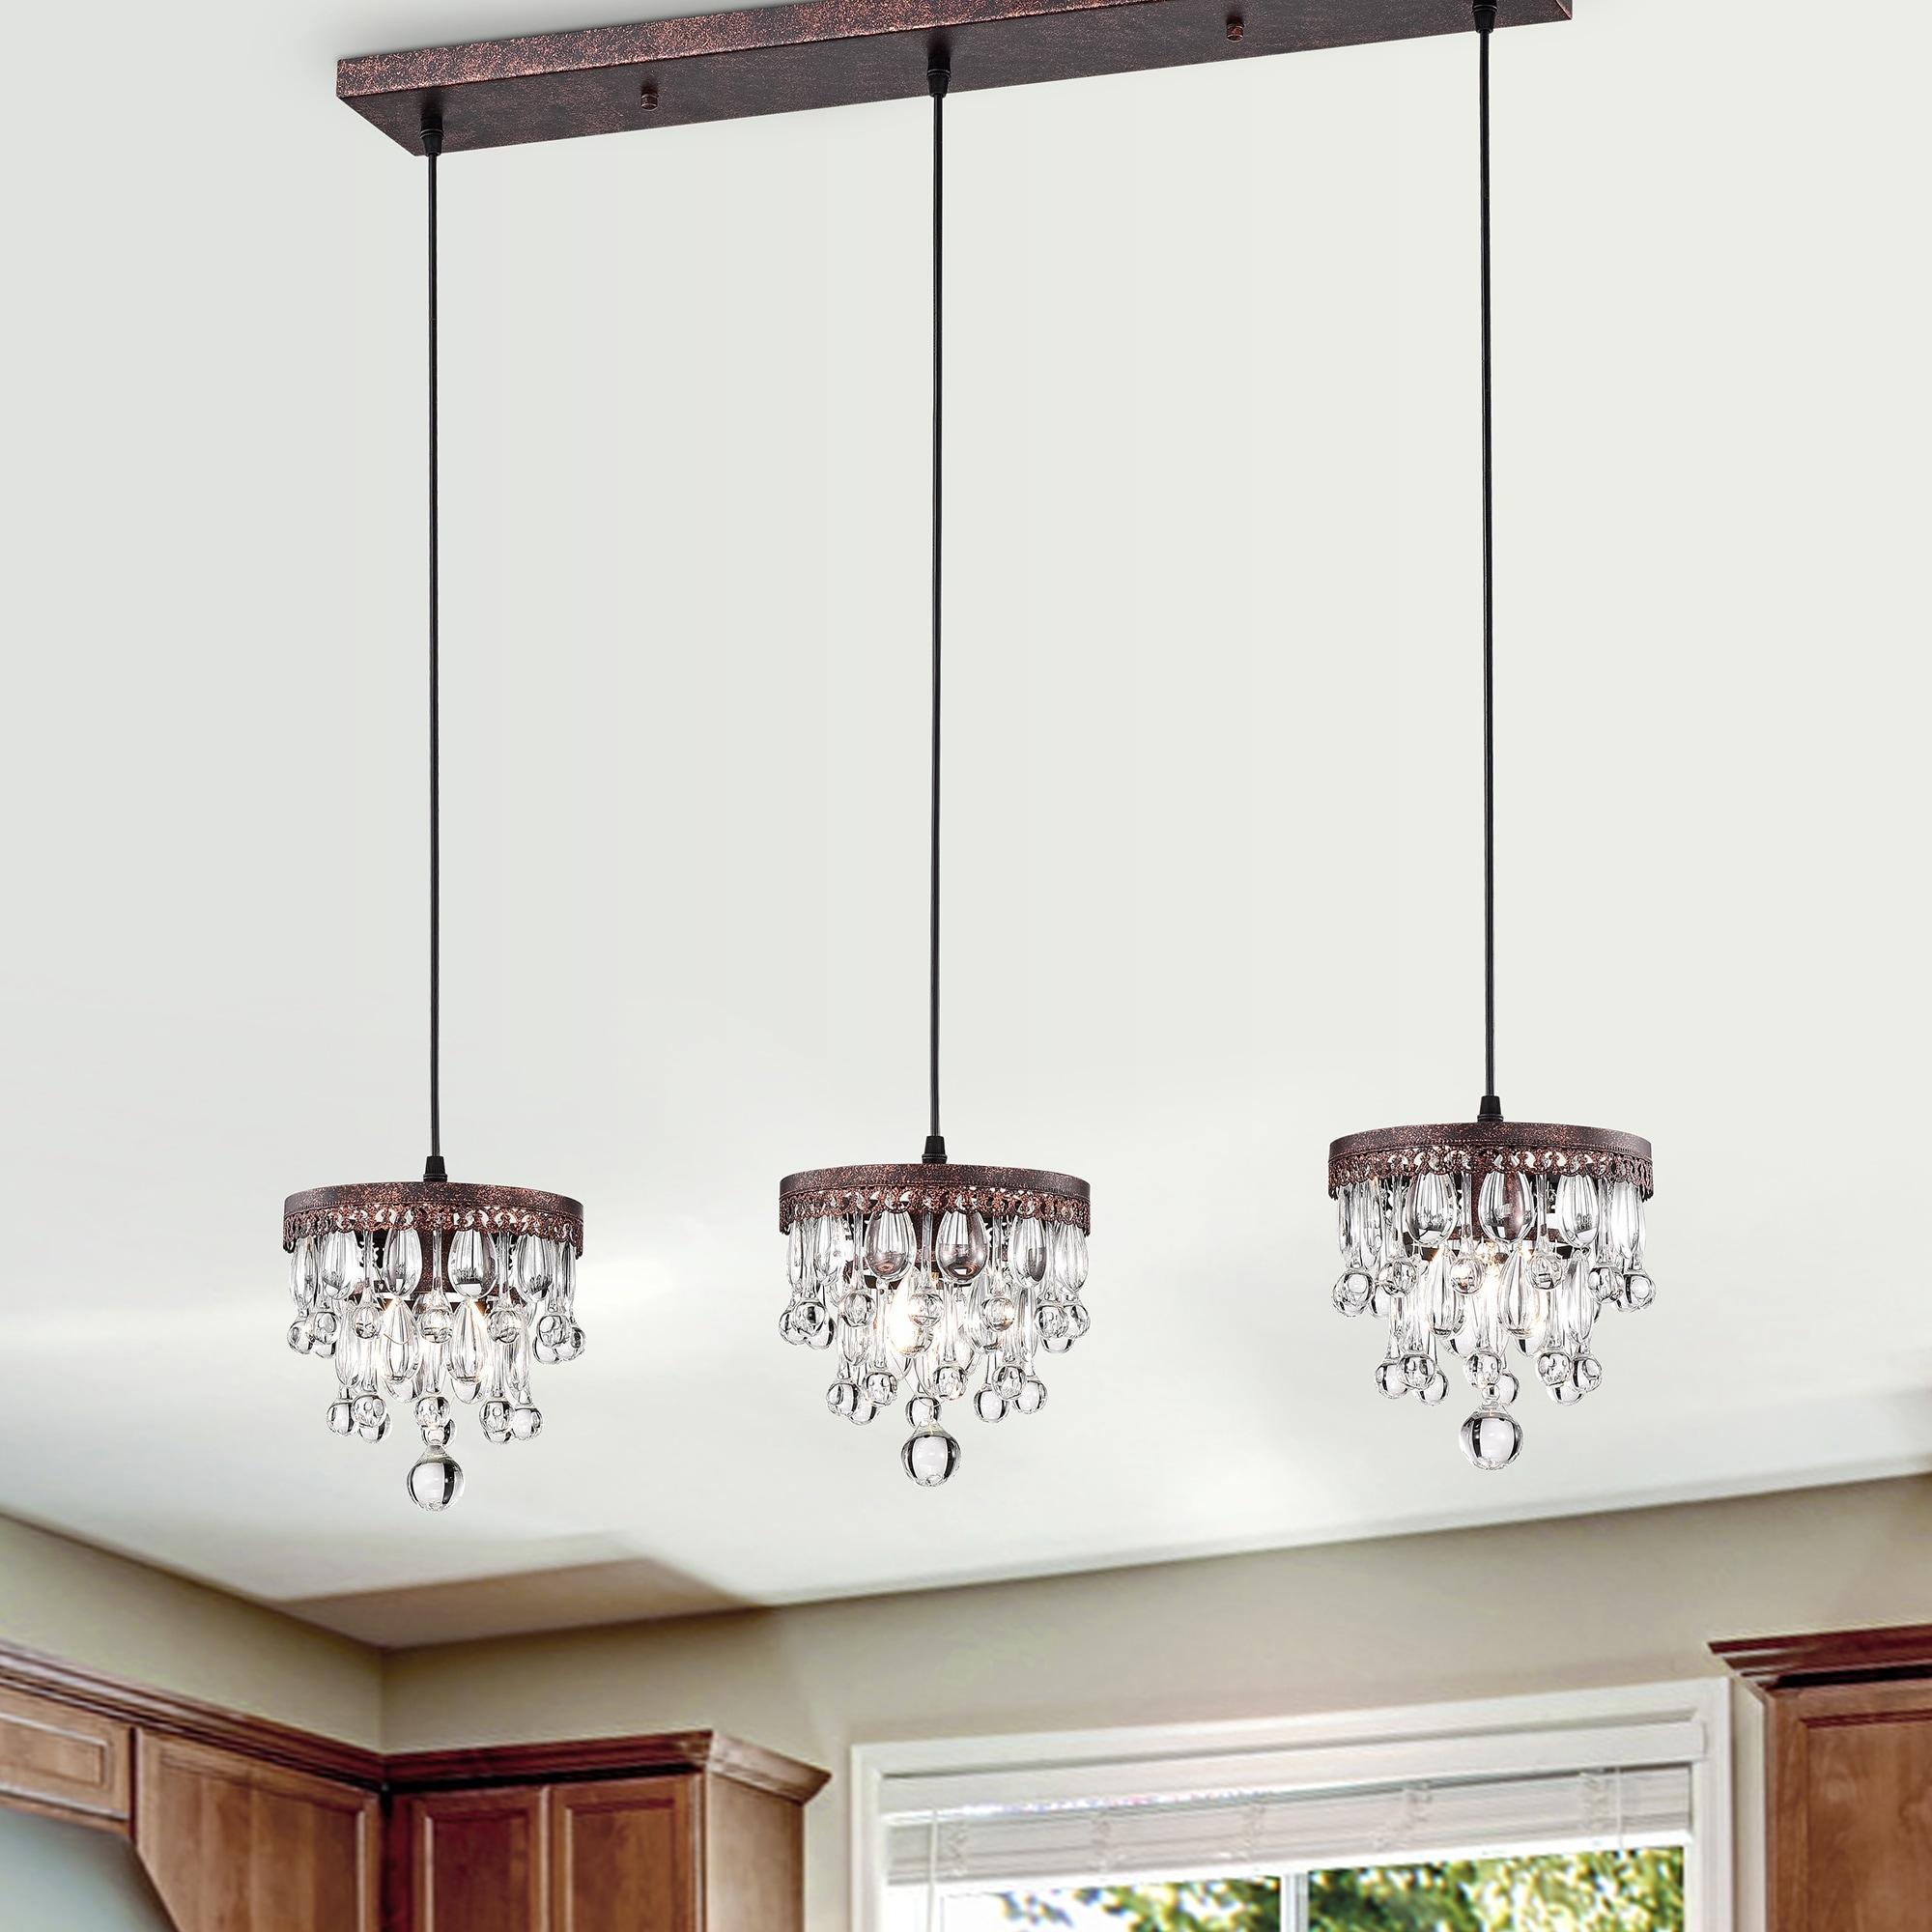 Shop Black Friday Deals On Jerri Antique Copper 3 Light 5 Tier Hanging Crystals Kitchen Island Pendant Light Overstock 31828138